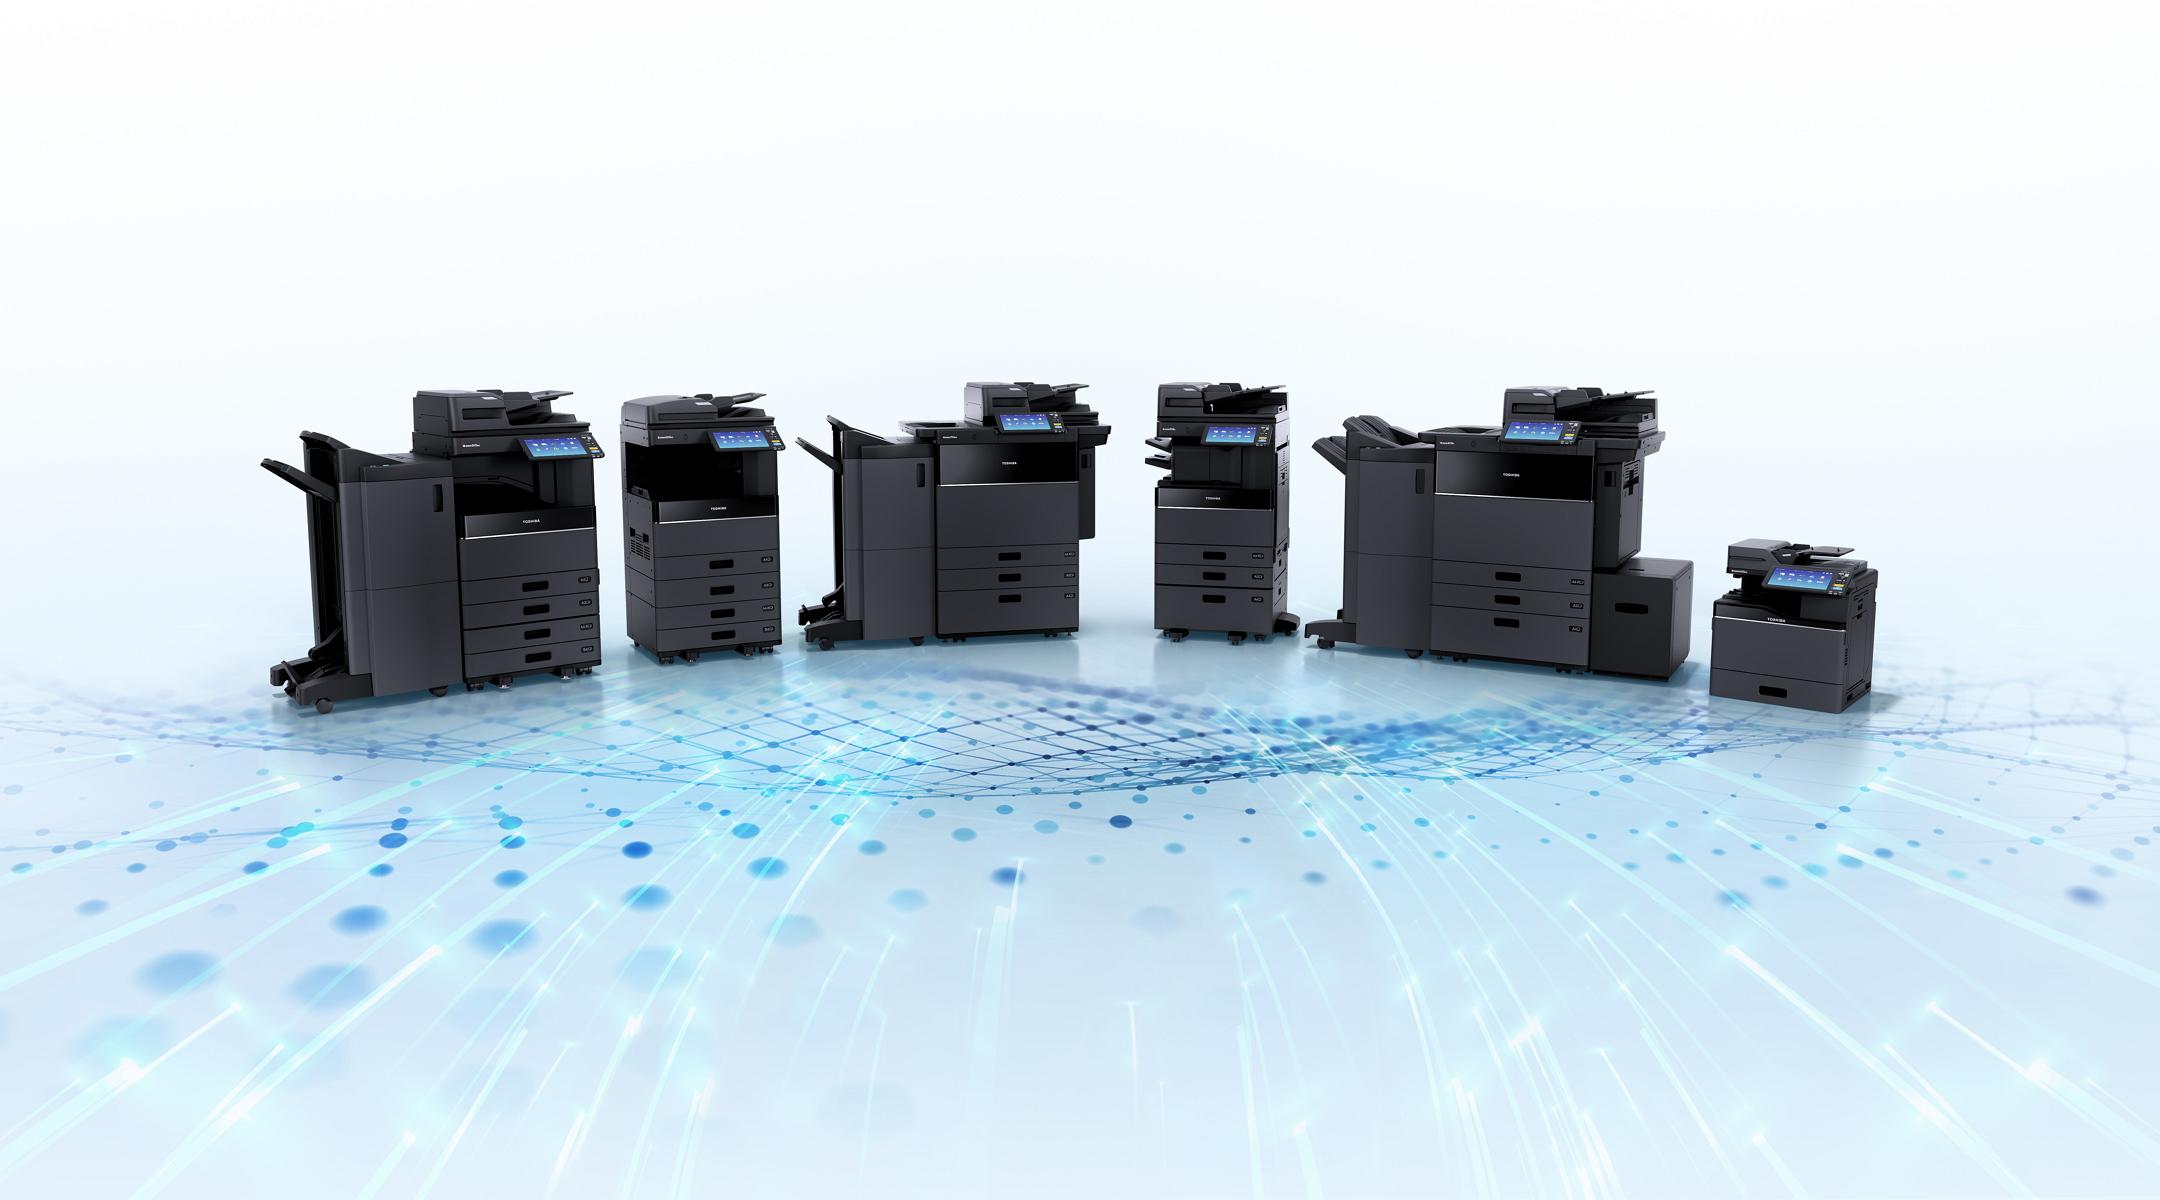 Gama impresoras de Toshiba para educación.